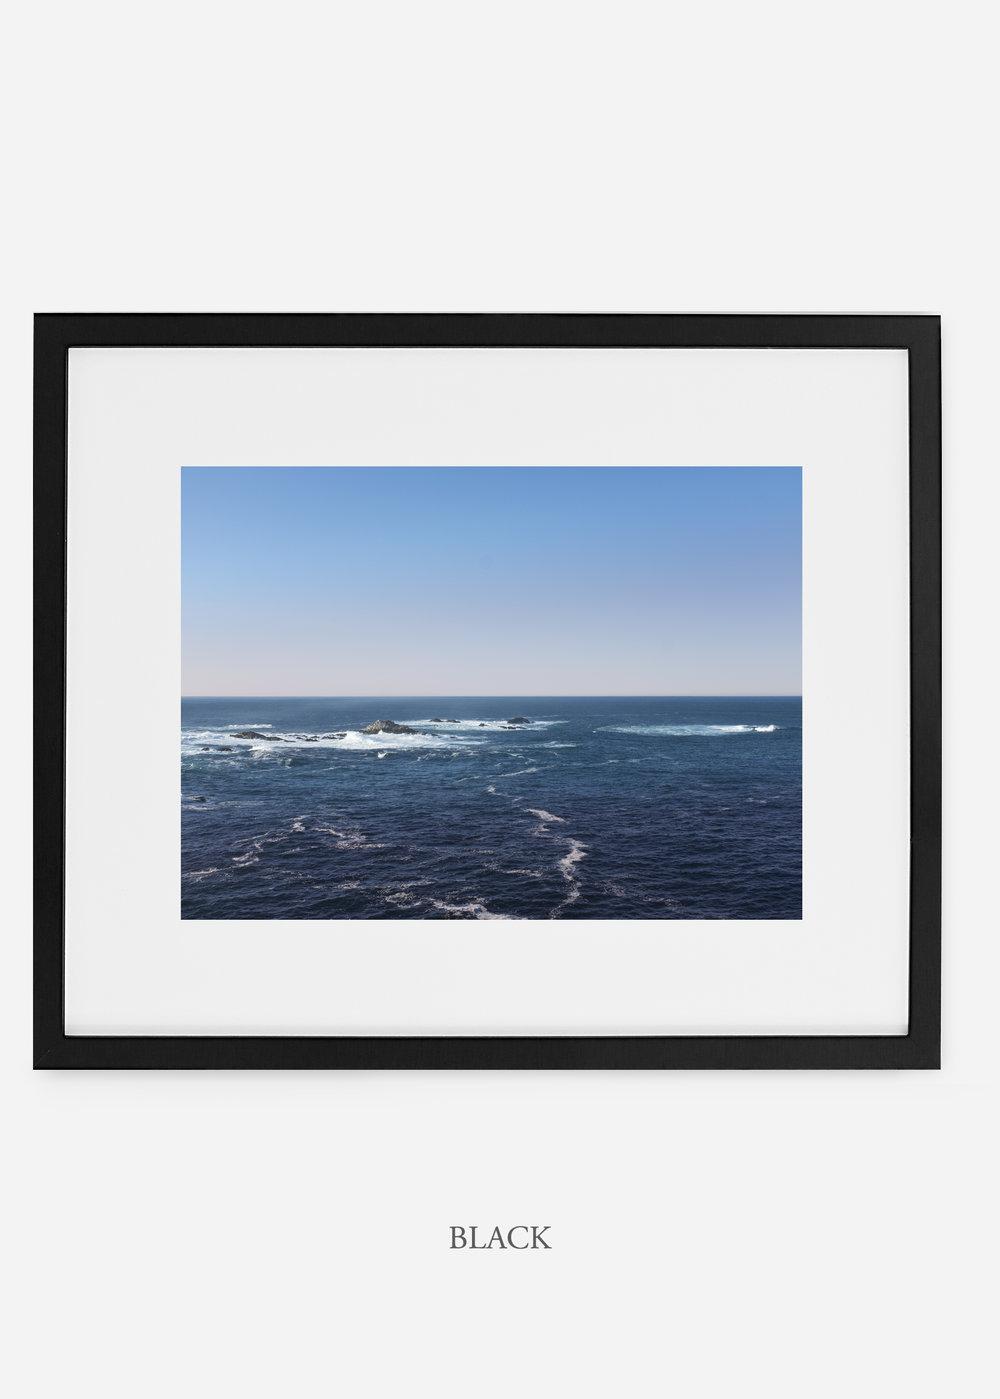 WilderCalifornia_blackframe_interiordesign_oceanprint_PacificOceanNo.1.jpg